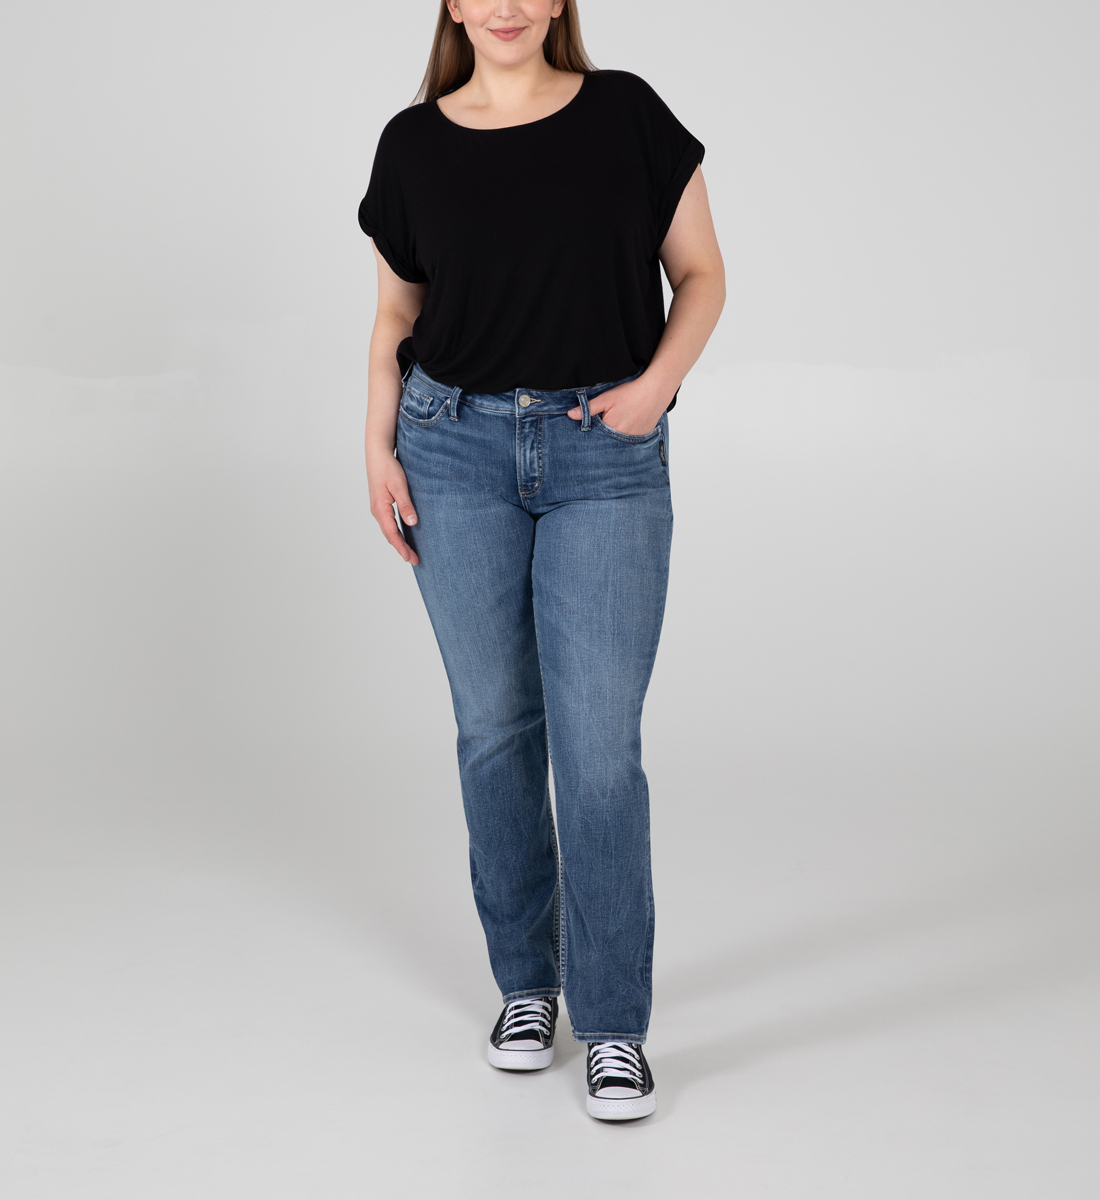 Silver Jeans Elyse Mid Rise Straight Leg Jeans Plus Size